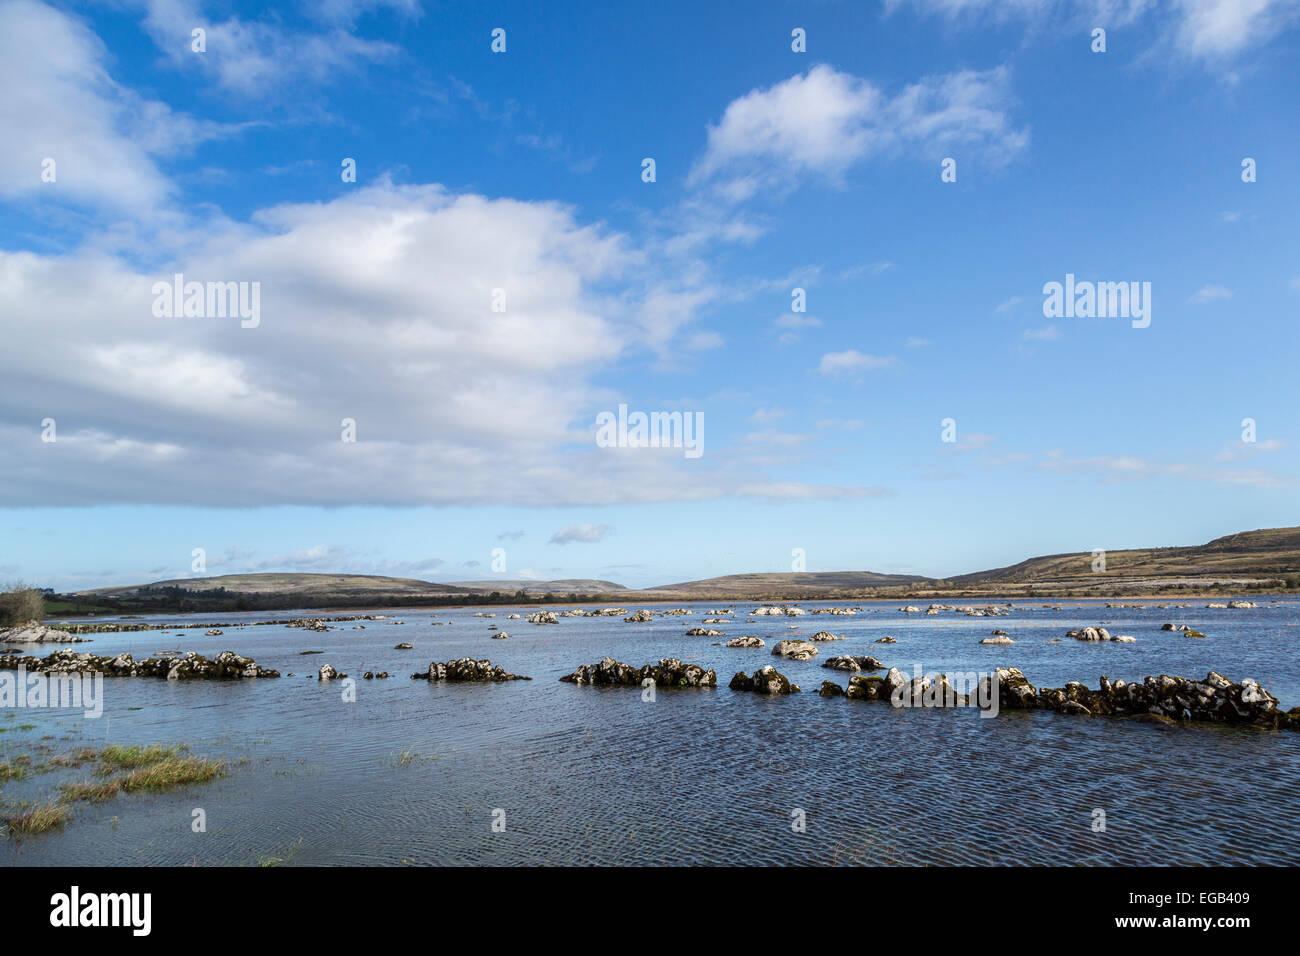 Carran Turlough saisonal überfluteten Felder, Burren, Co. Clare, Irland Stockbild